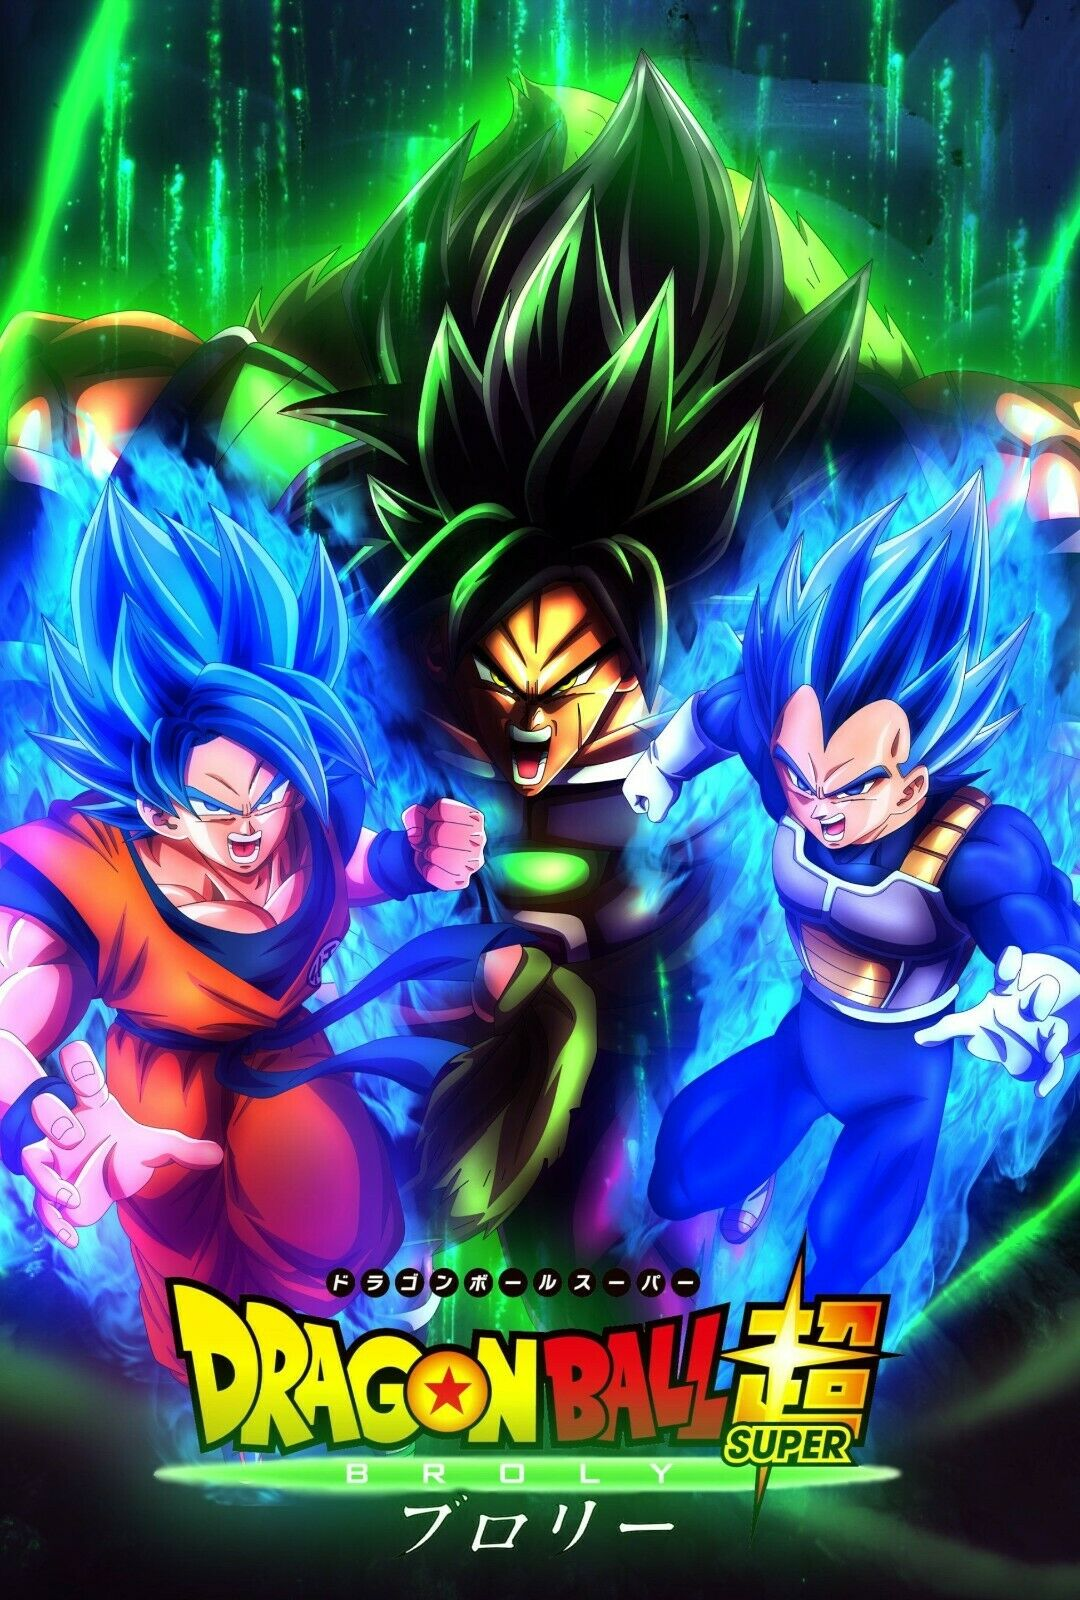 Dragon Ball Super Poster Trunks All Forms SSJ 1 2 Rage DBZ 11x17 13x19